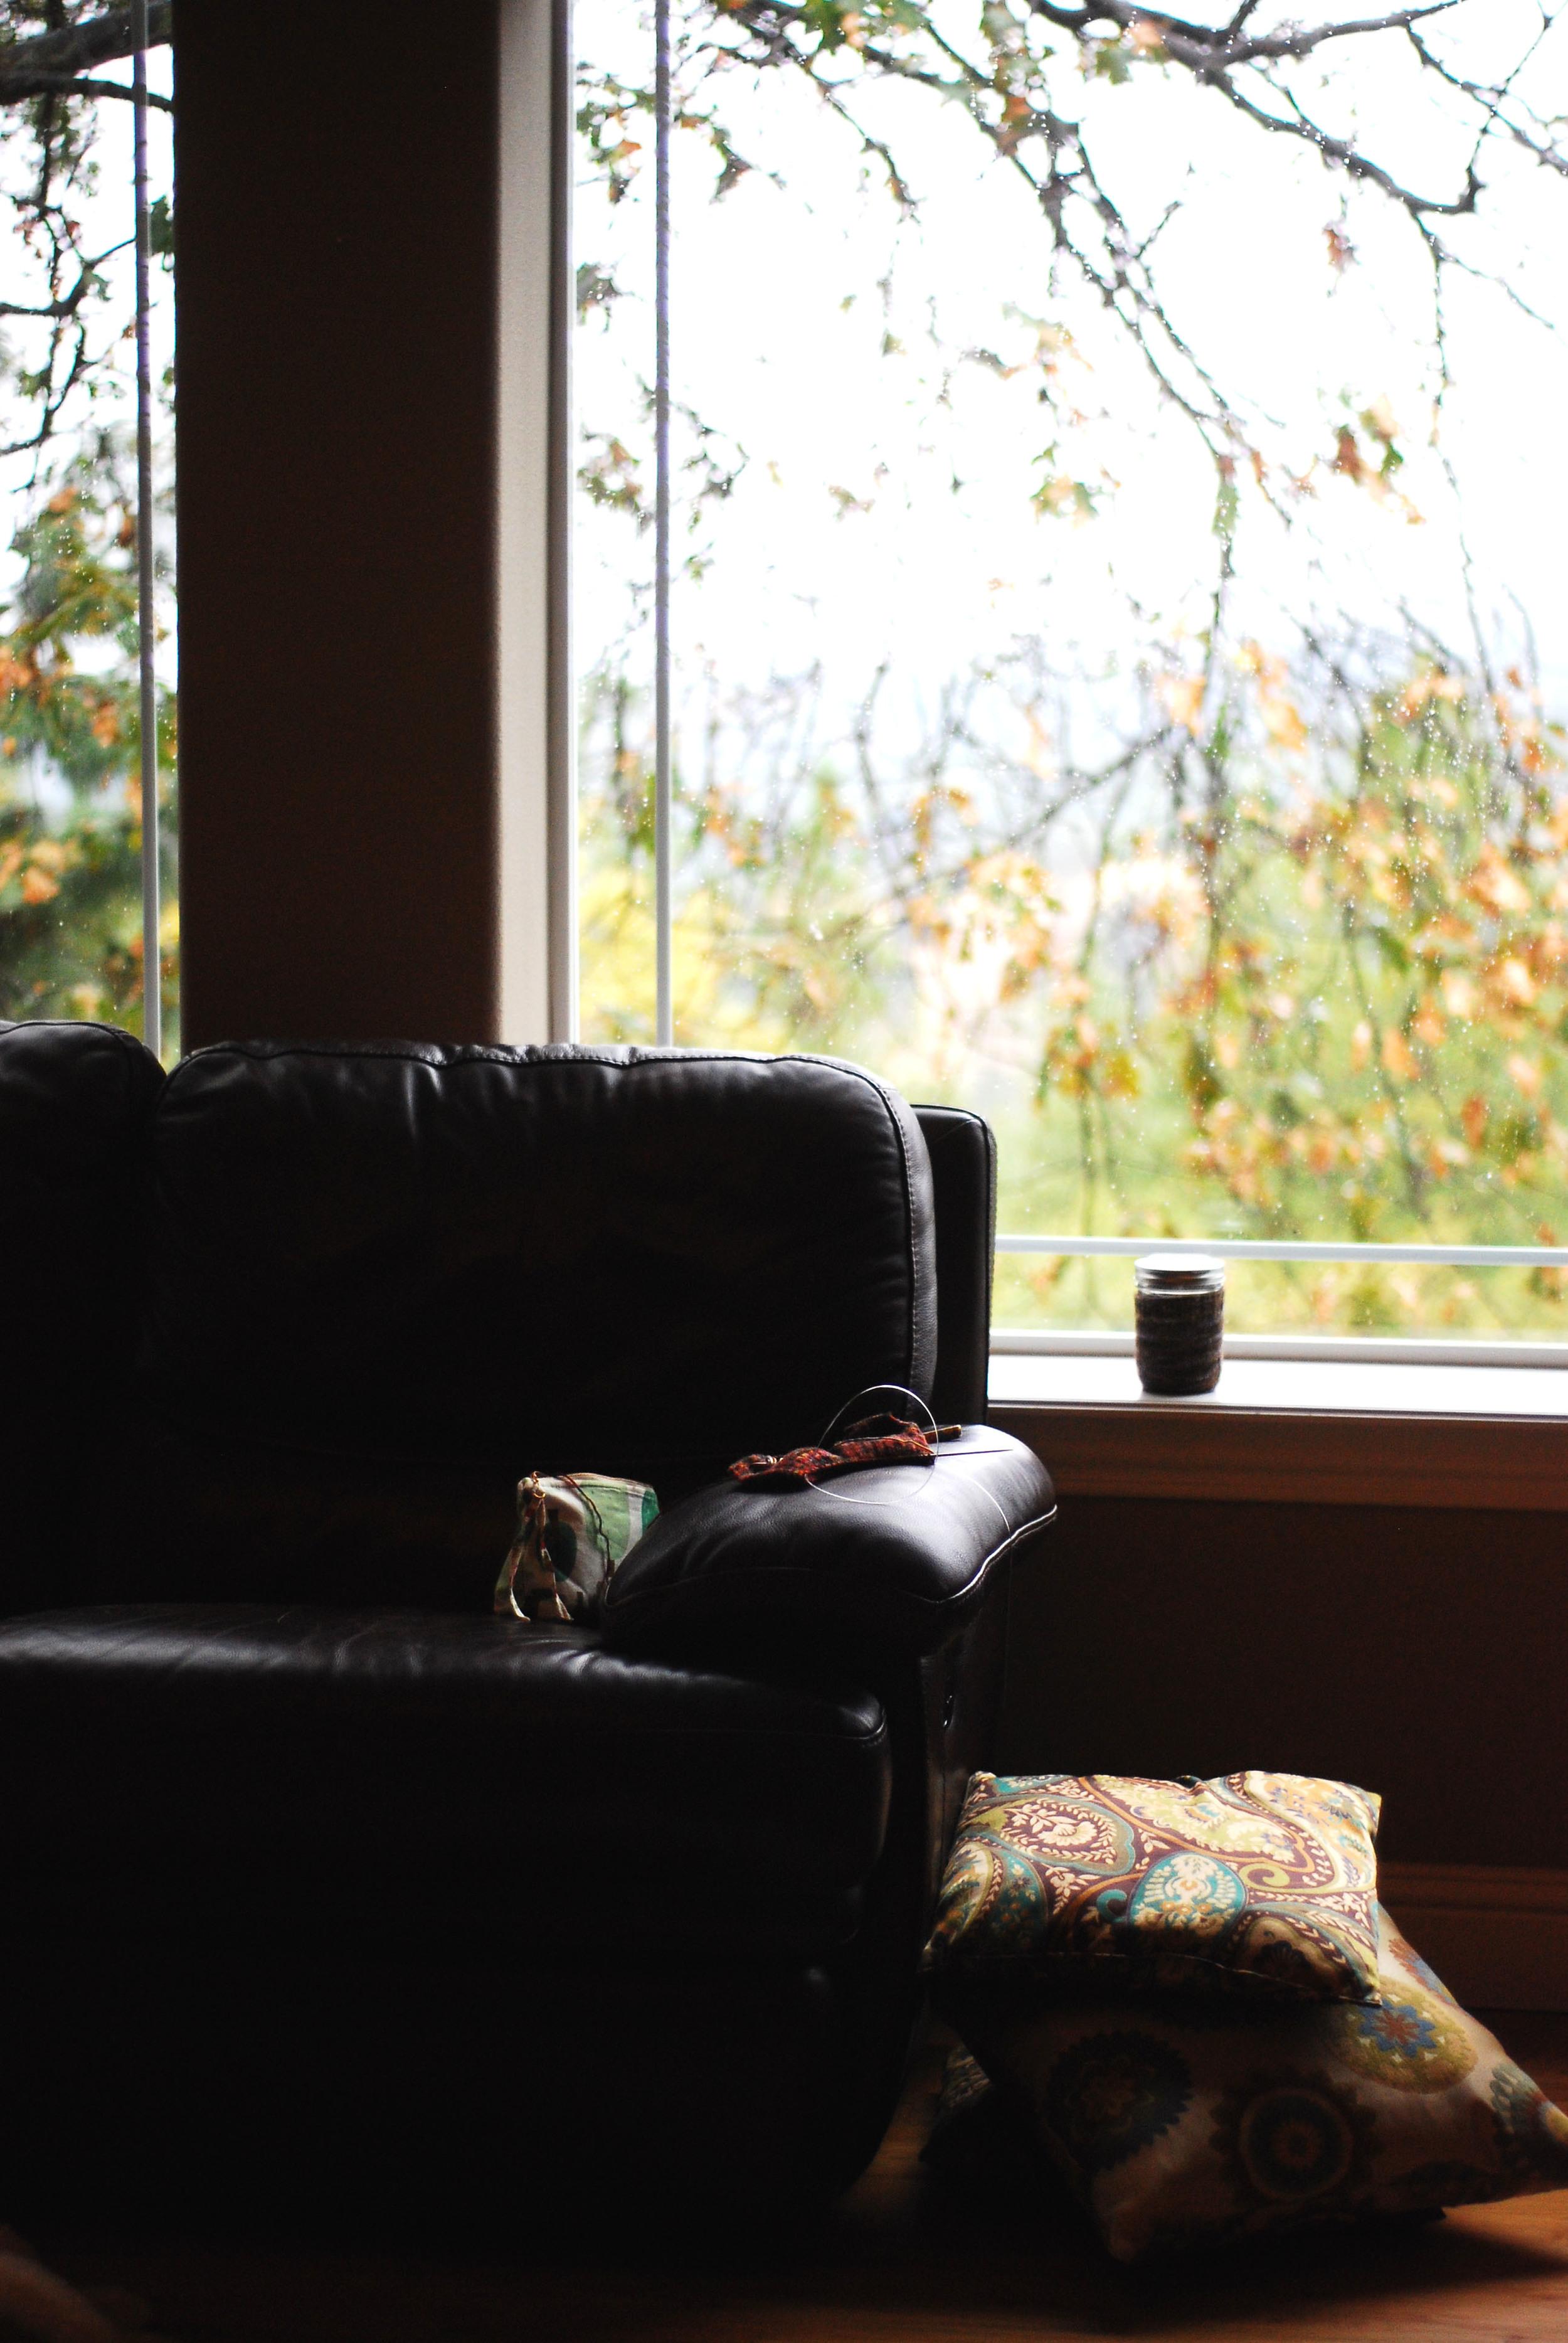 coziestchair